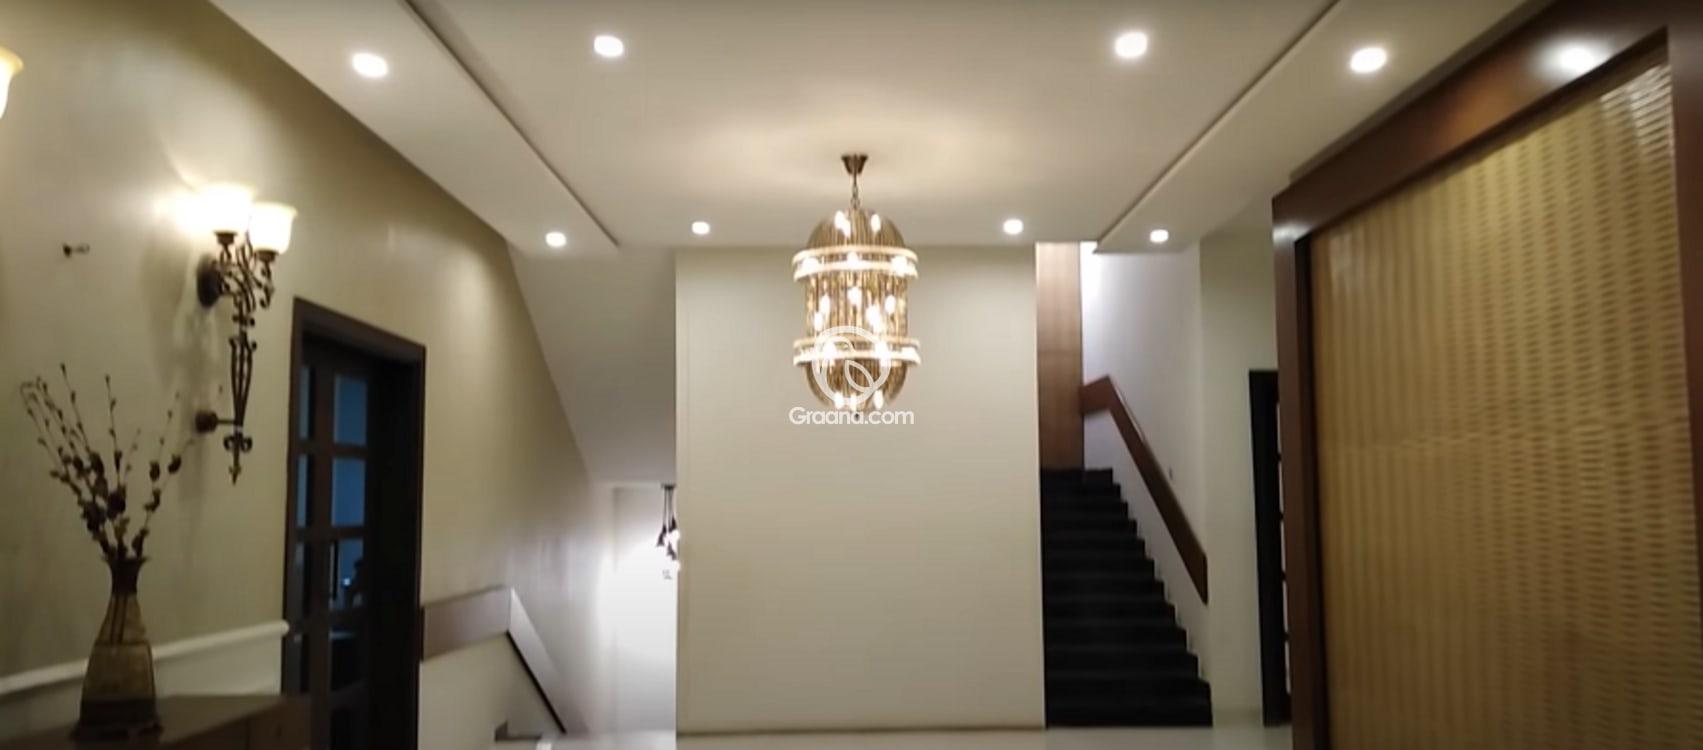 1850 Sqft Apartment for Sale | Graana.com